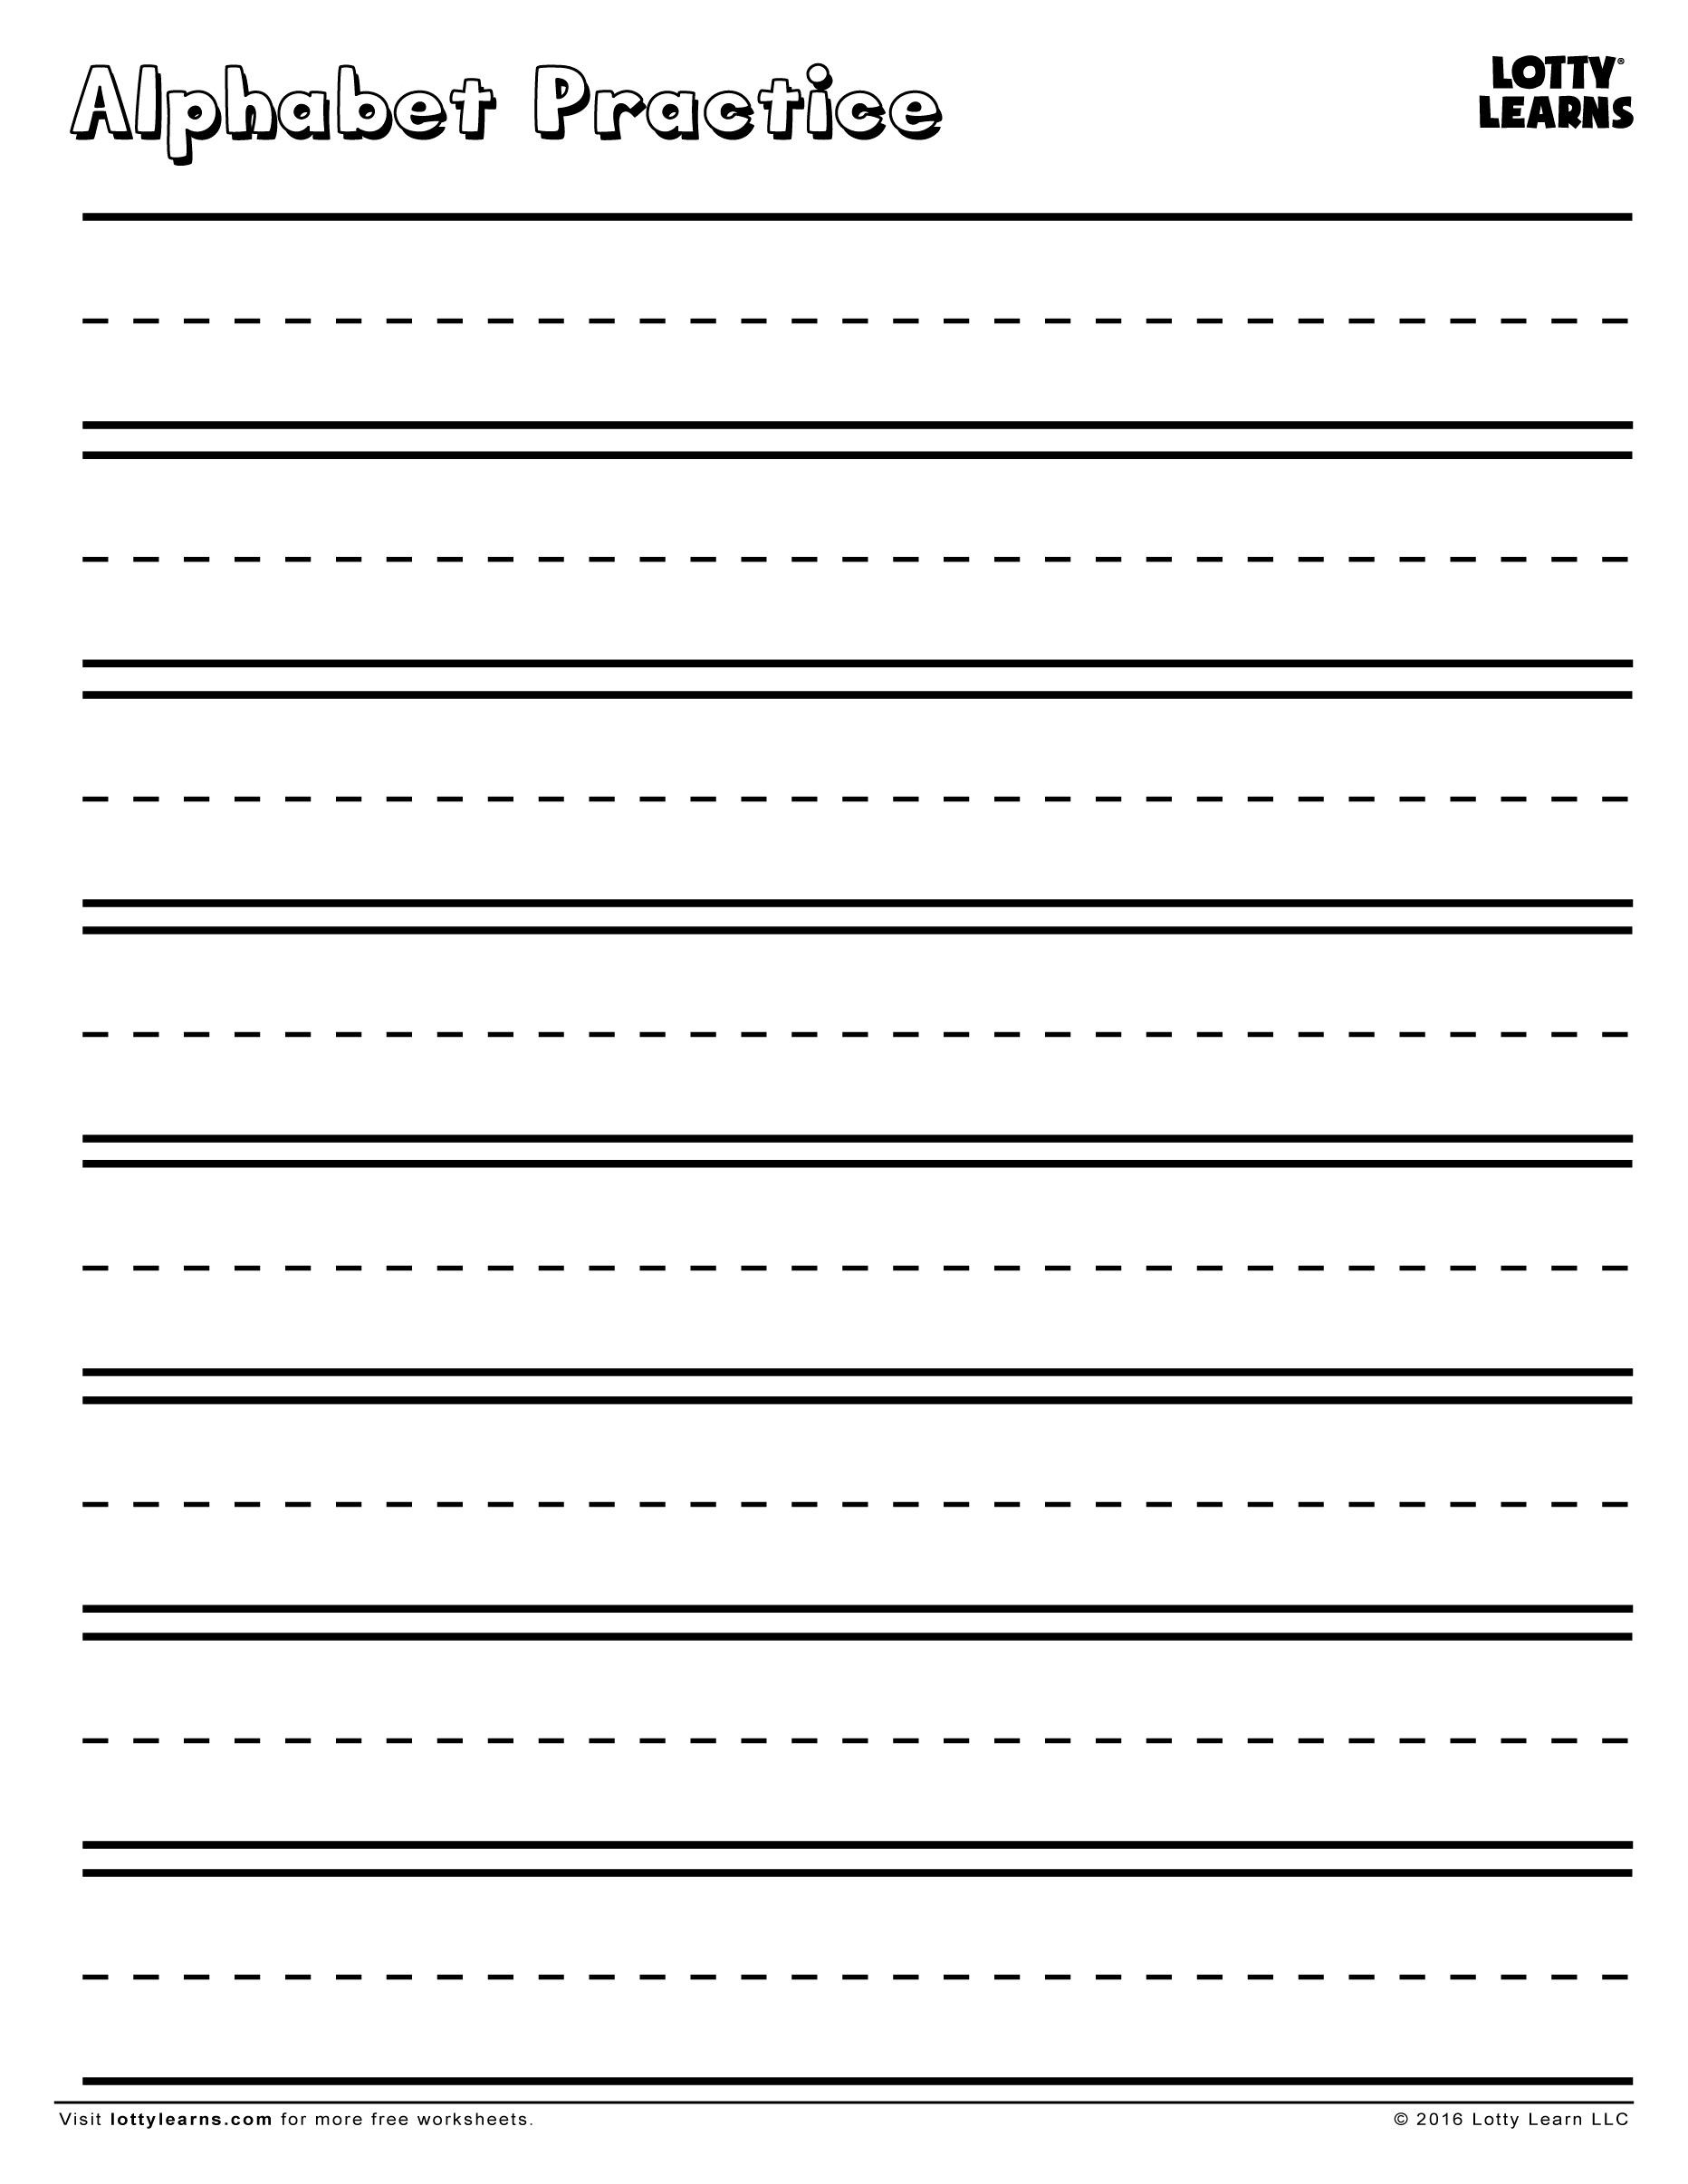 Practice Makes Perfect Blank Alphabet Practice Sheet